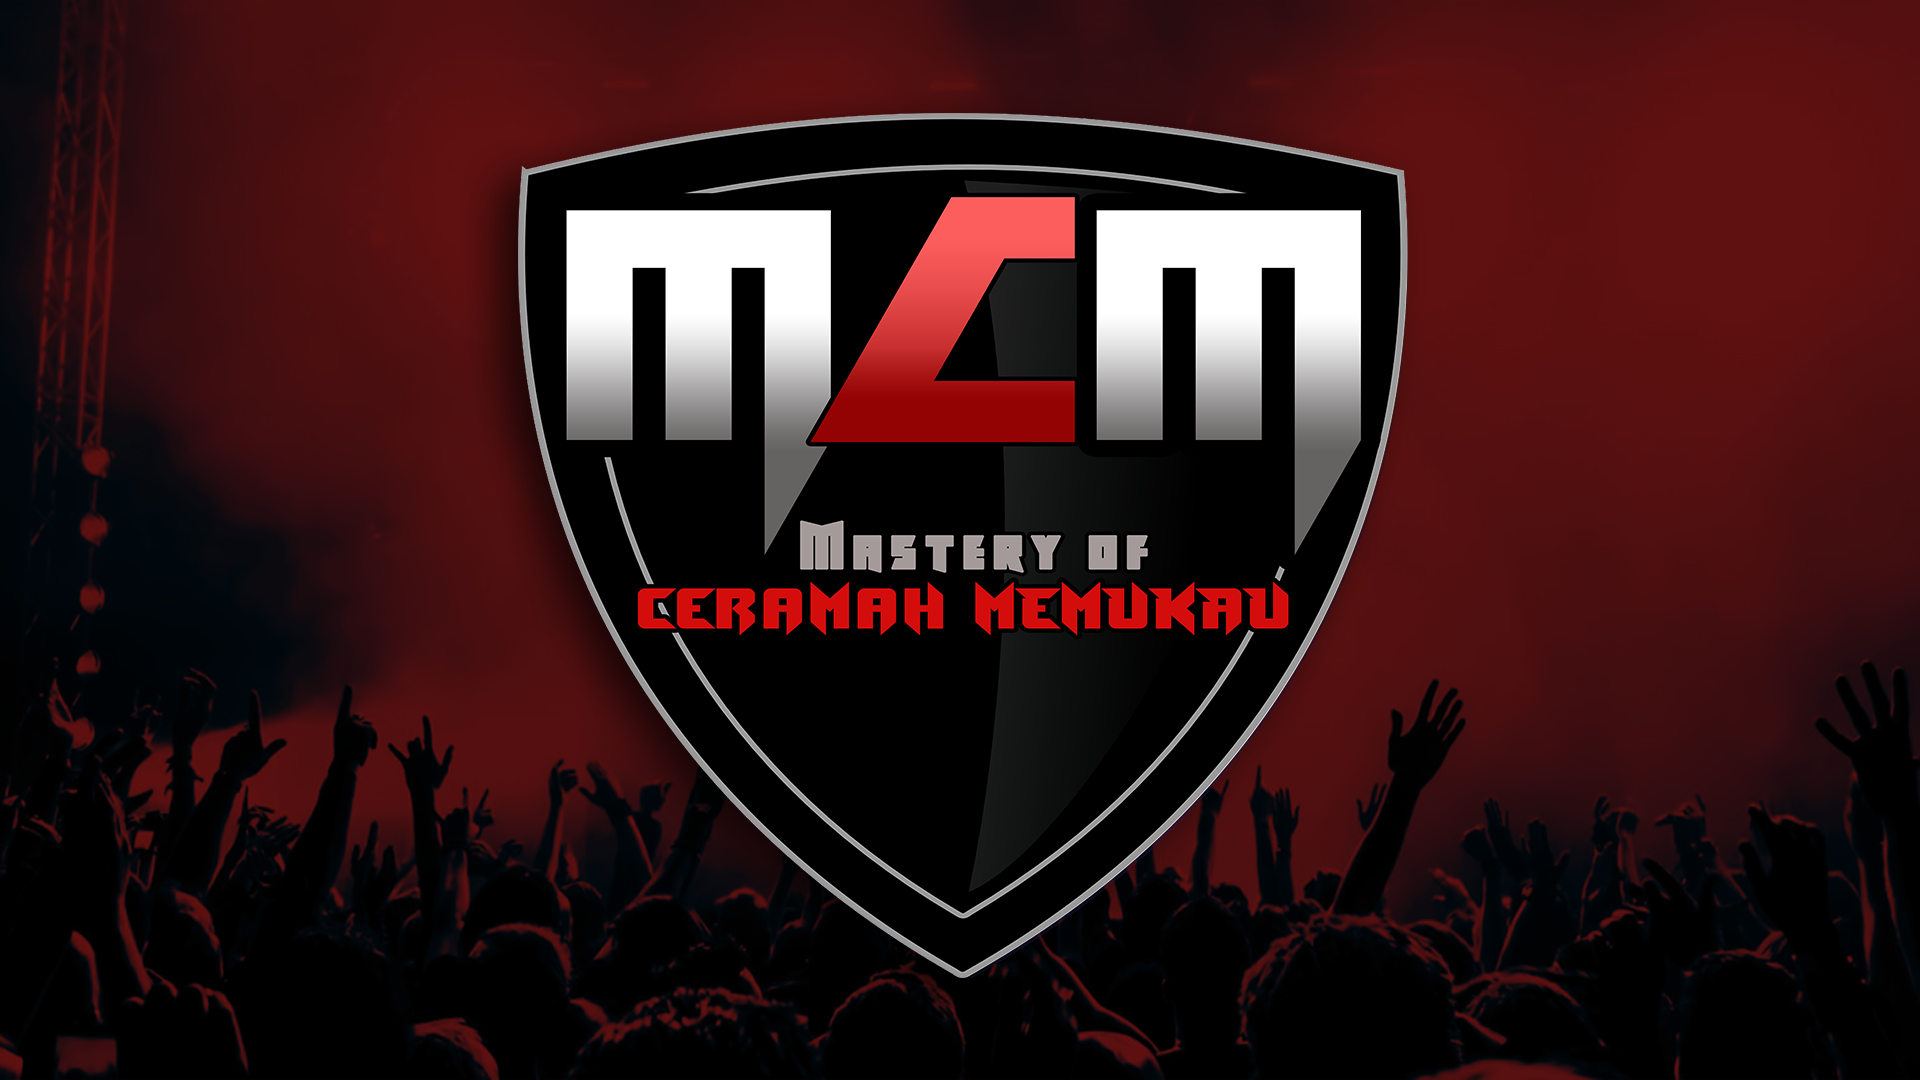 mastery-of-ceramah-memukau